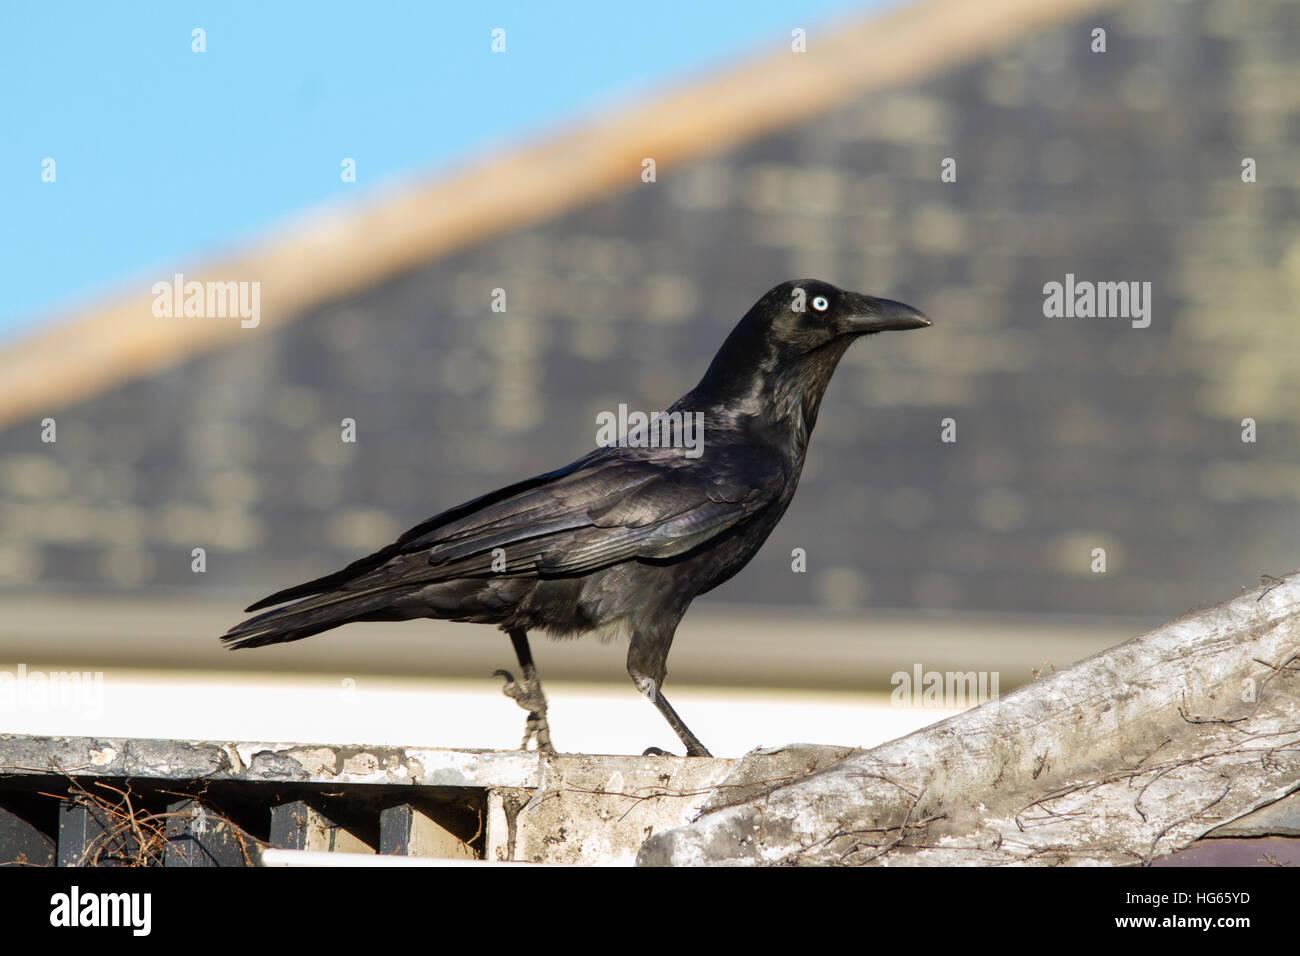 Forest Raven (Corvus tasmanicus) in an urban setting - Stock Image